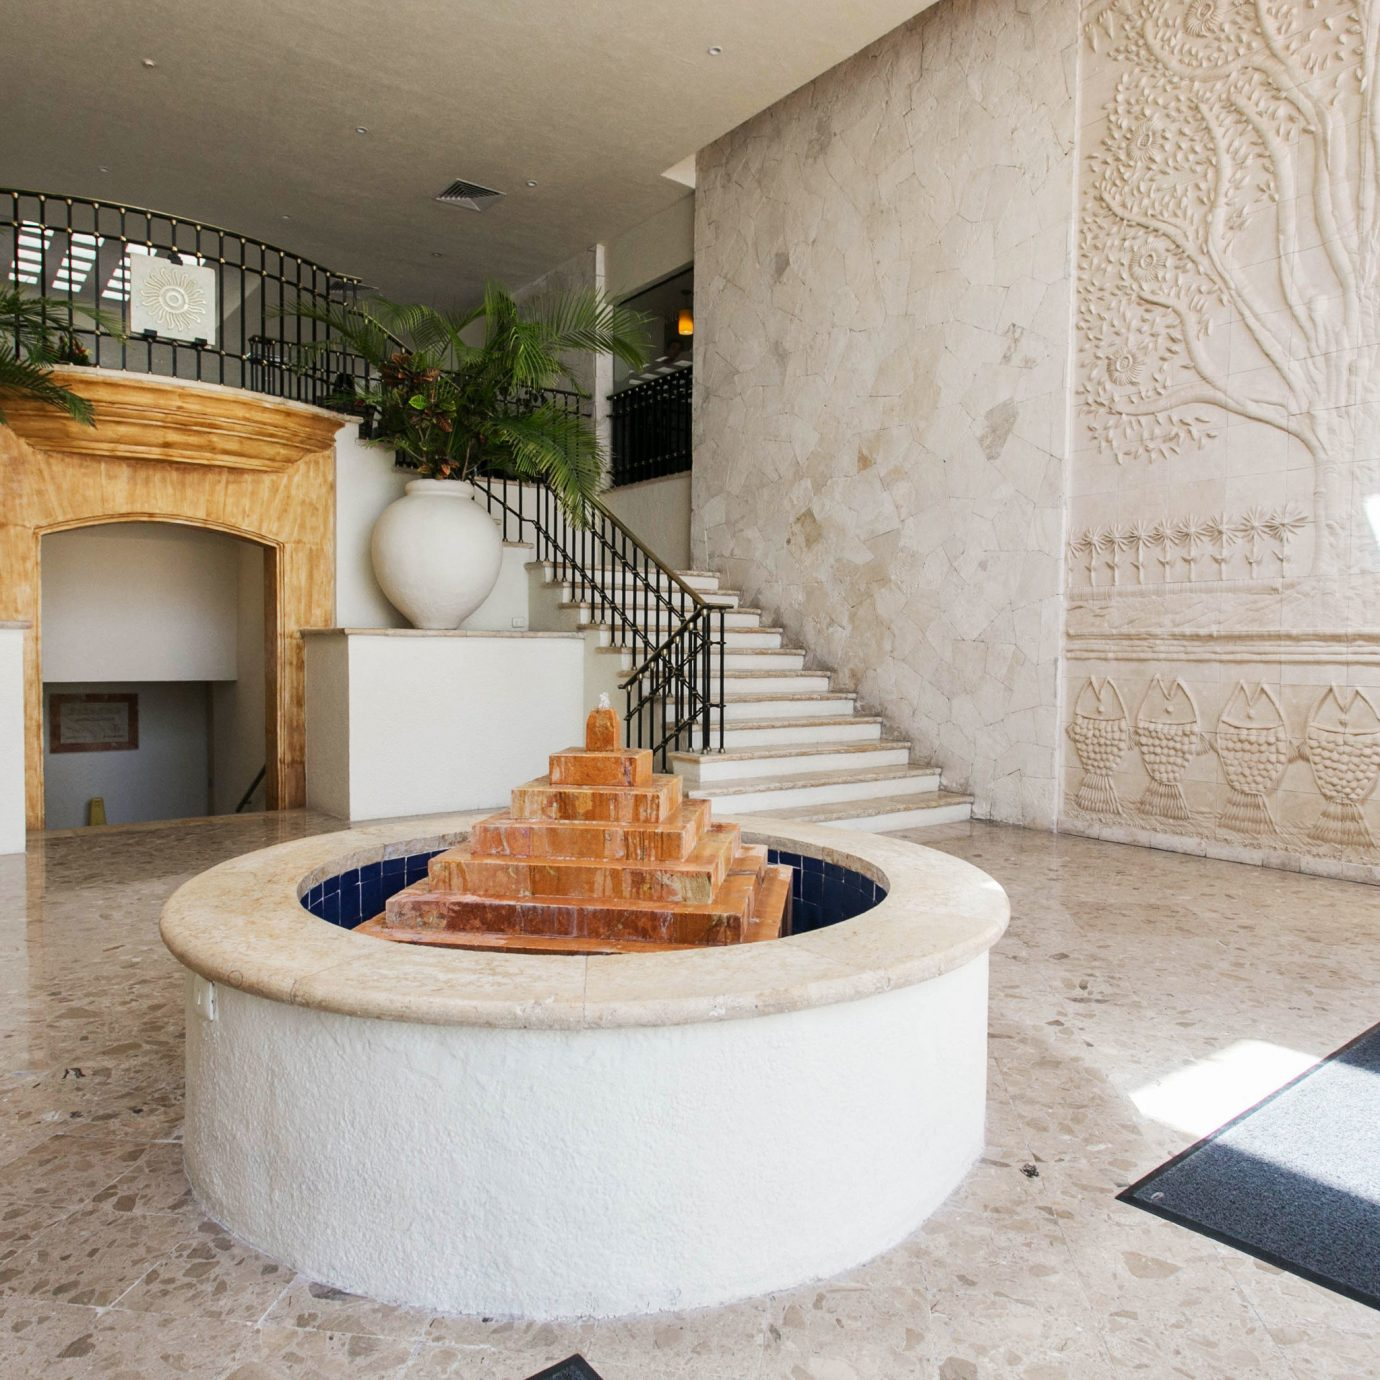 property living room swimming pool home flooring bathtub bathroom plumbing fixture stone